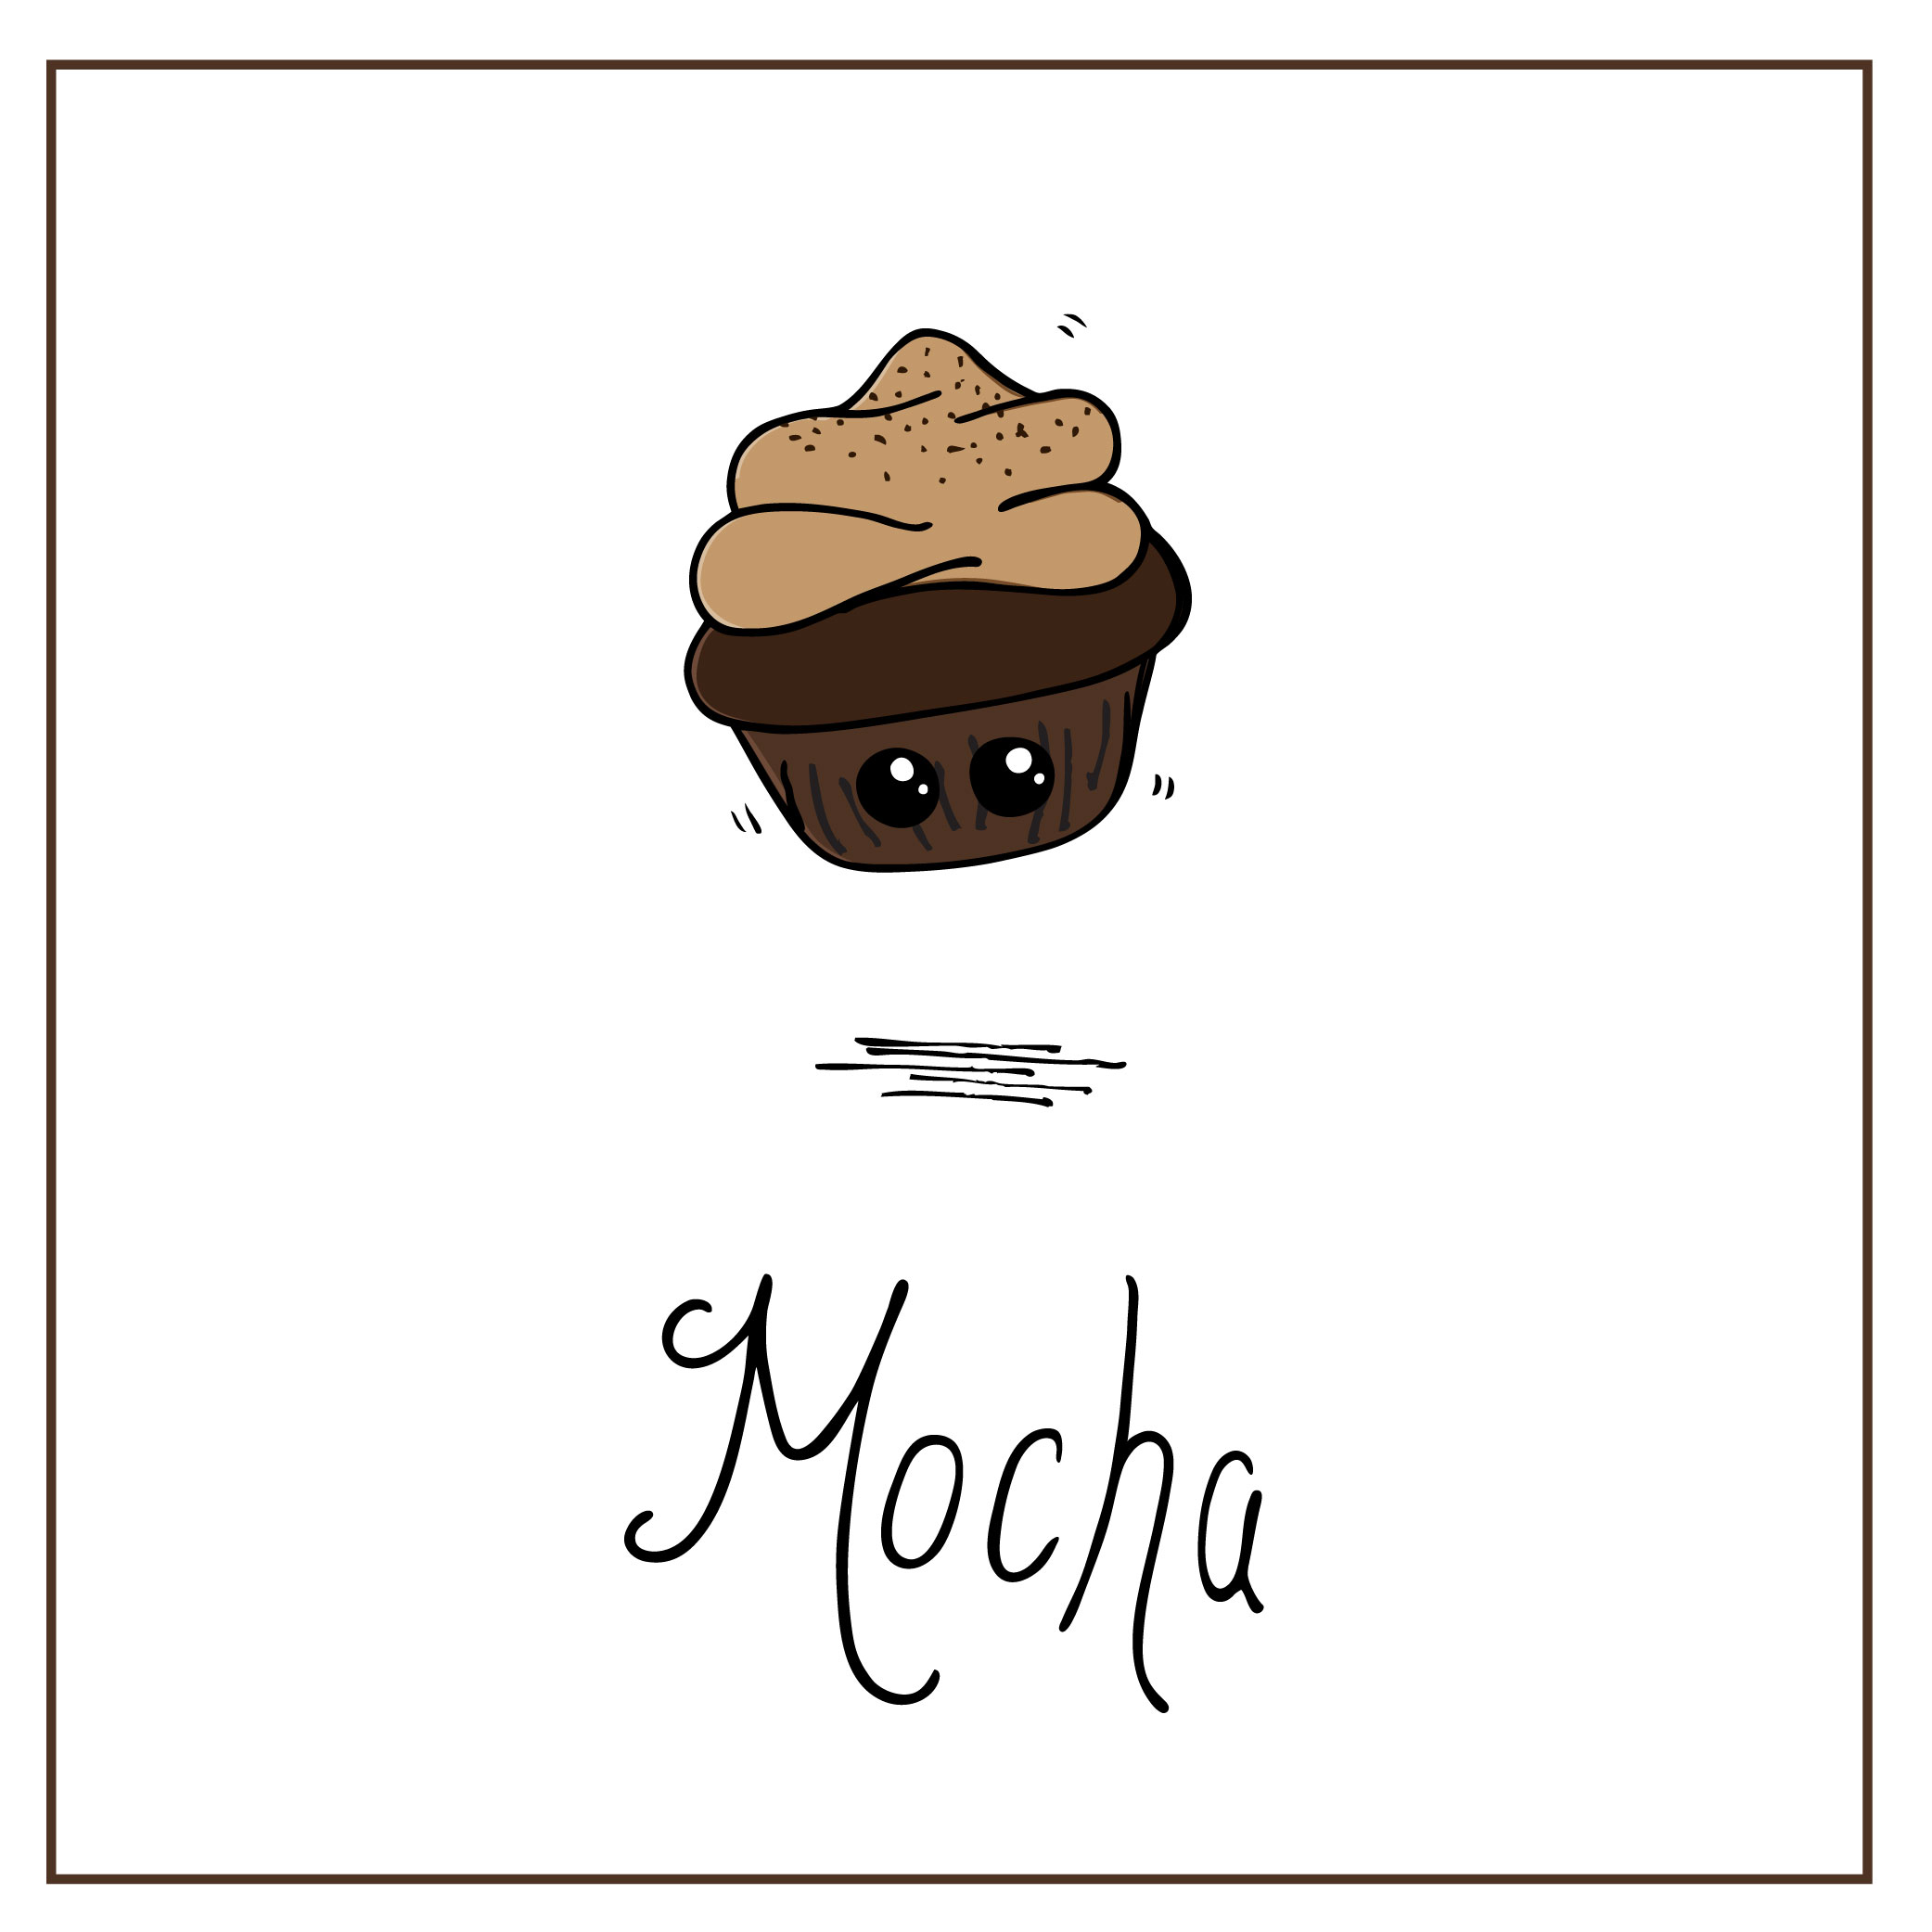 Mocha-Squared-01.jpg